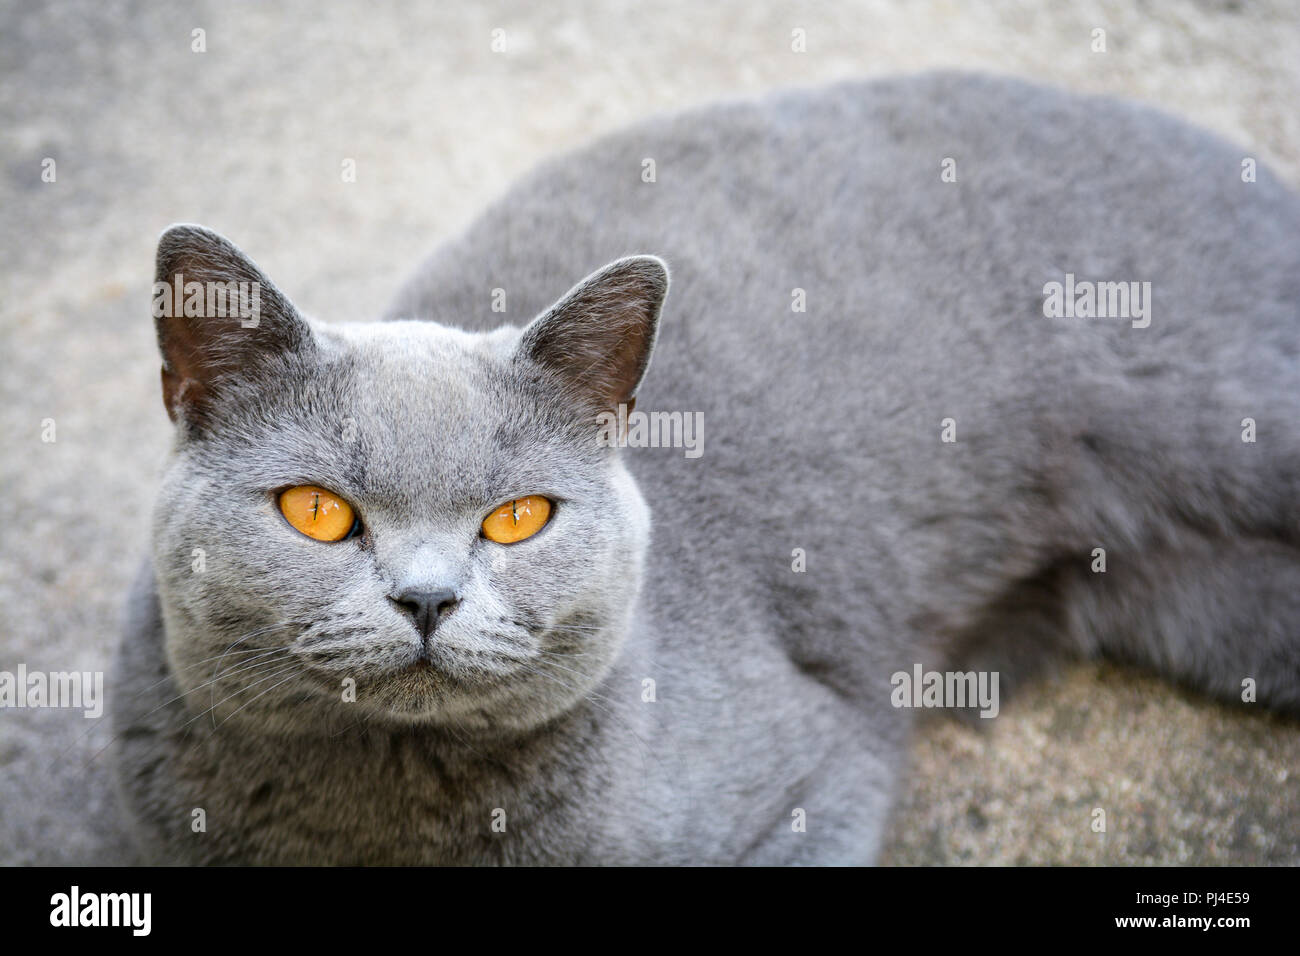 Cat With Bright Orange Eyes Resting On The Floor Stock Photo Alamy